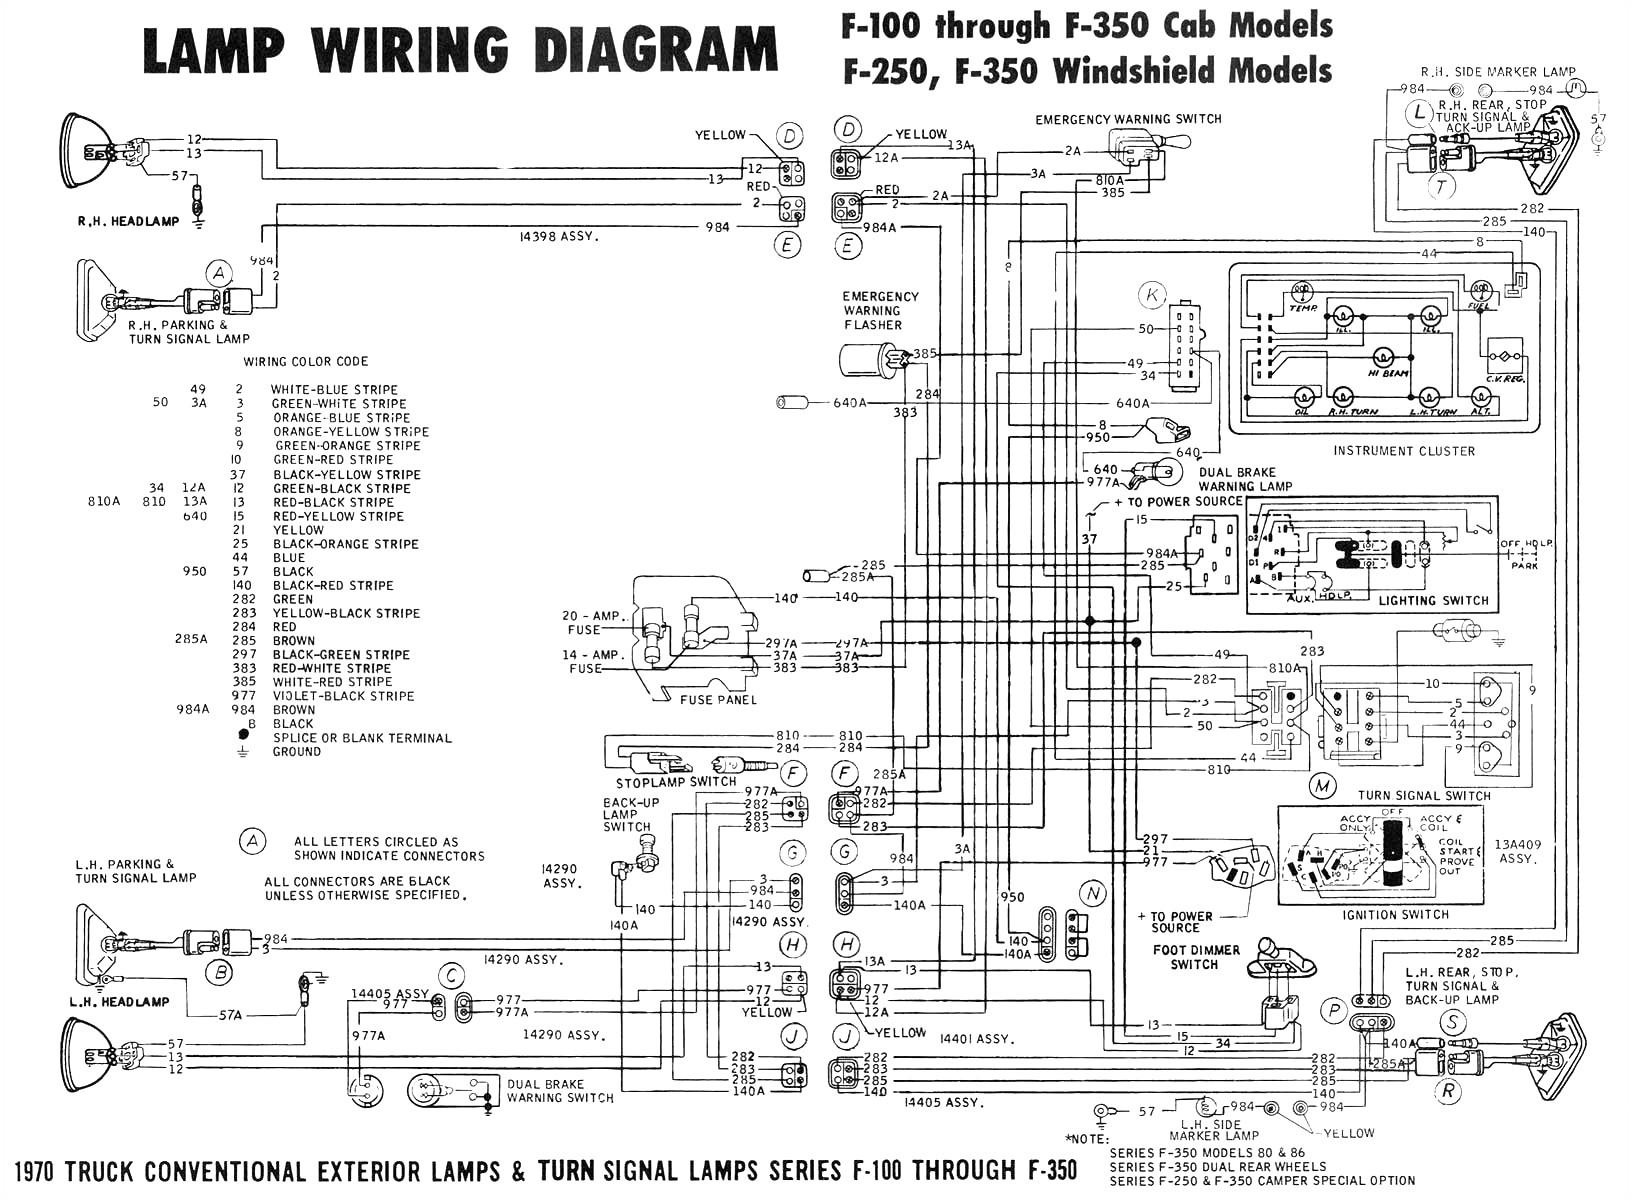 fuse box diagram besides 1990 chevy 350 tbi fuel system diagram wiring diagram for 1996 chevy vortec 57l chevrolet forum chevy